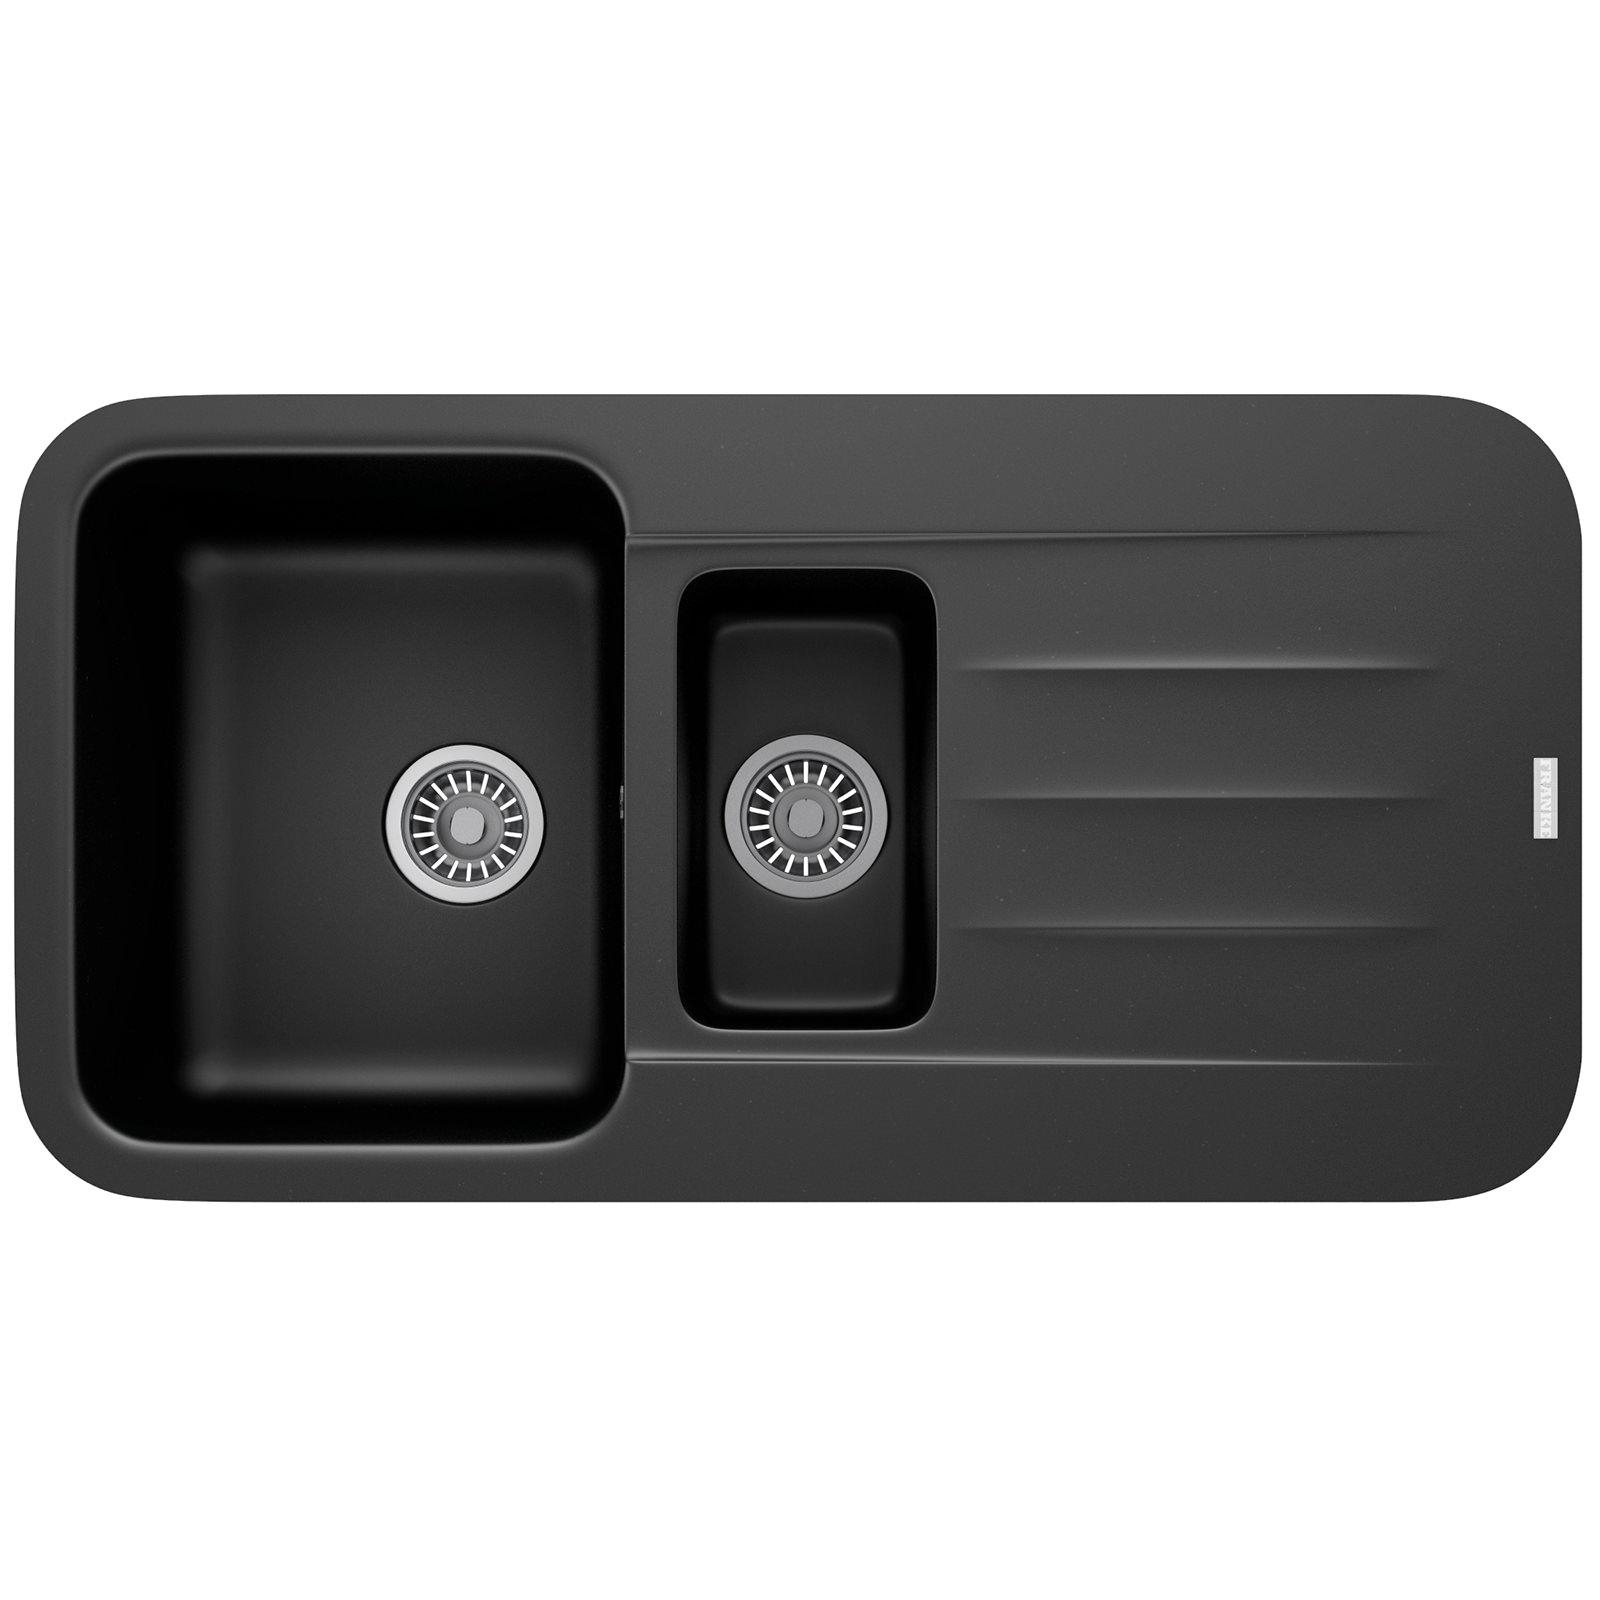 Franke 651 Sink : Franke Pebel PBG 651 Fragranite Onyx 1.5 Bowl Inset Sink 114.0251 ...